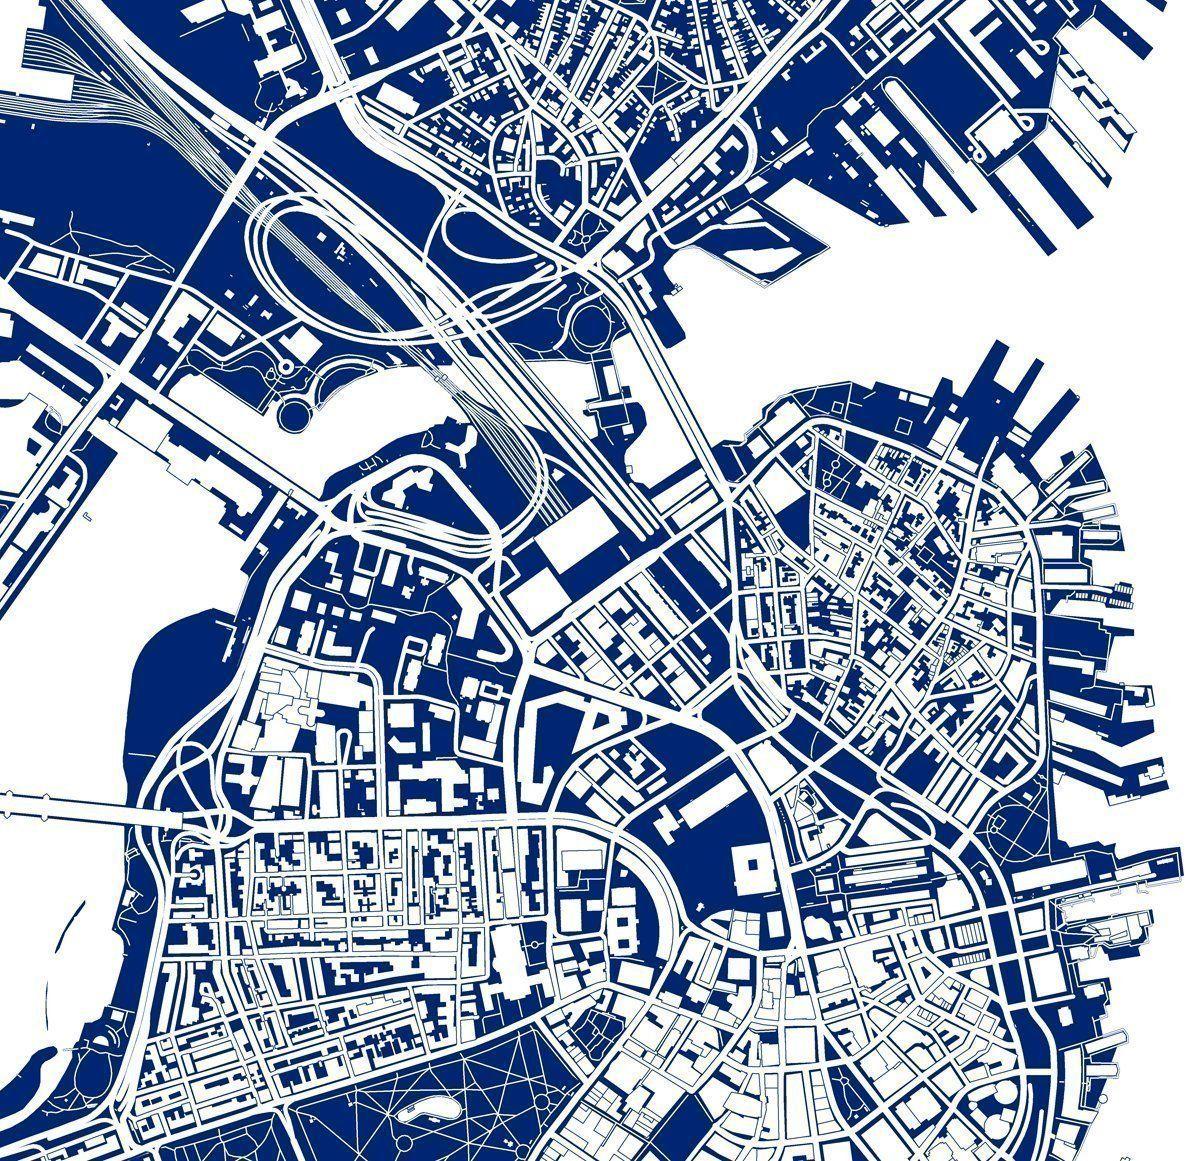 Boston map art print massachusetts navy blue blueprint style city boston map art print massachusetts navy blue blueprint style city artwork malvernweather Choice Image